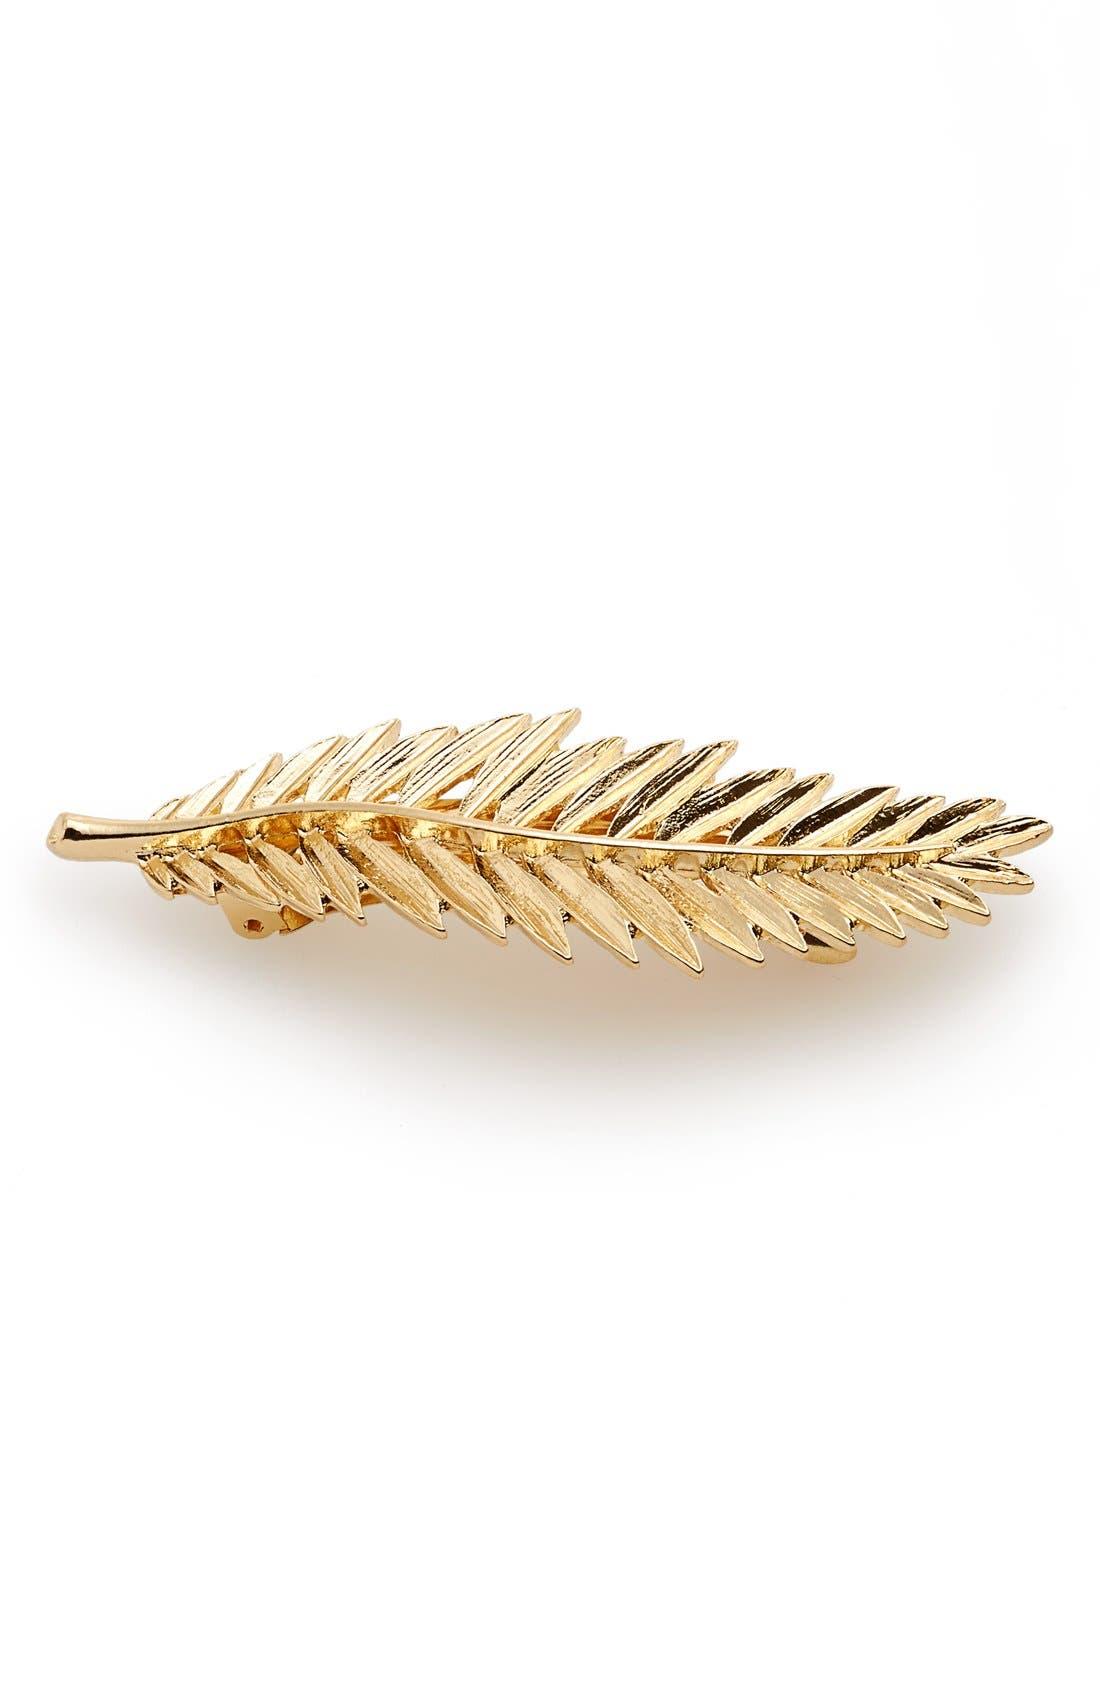 Main Image - Cara 'Gold Leaves' Barrette